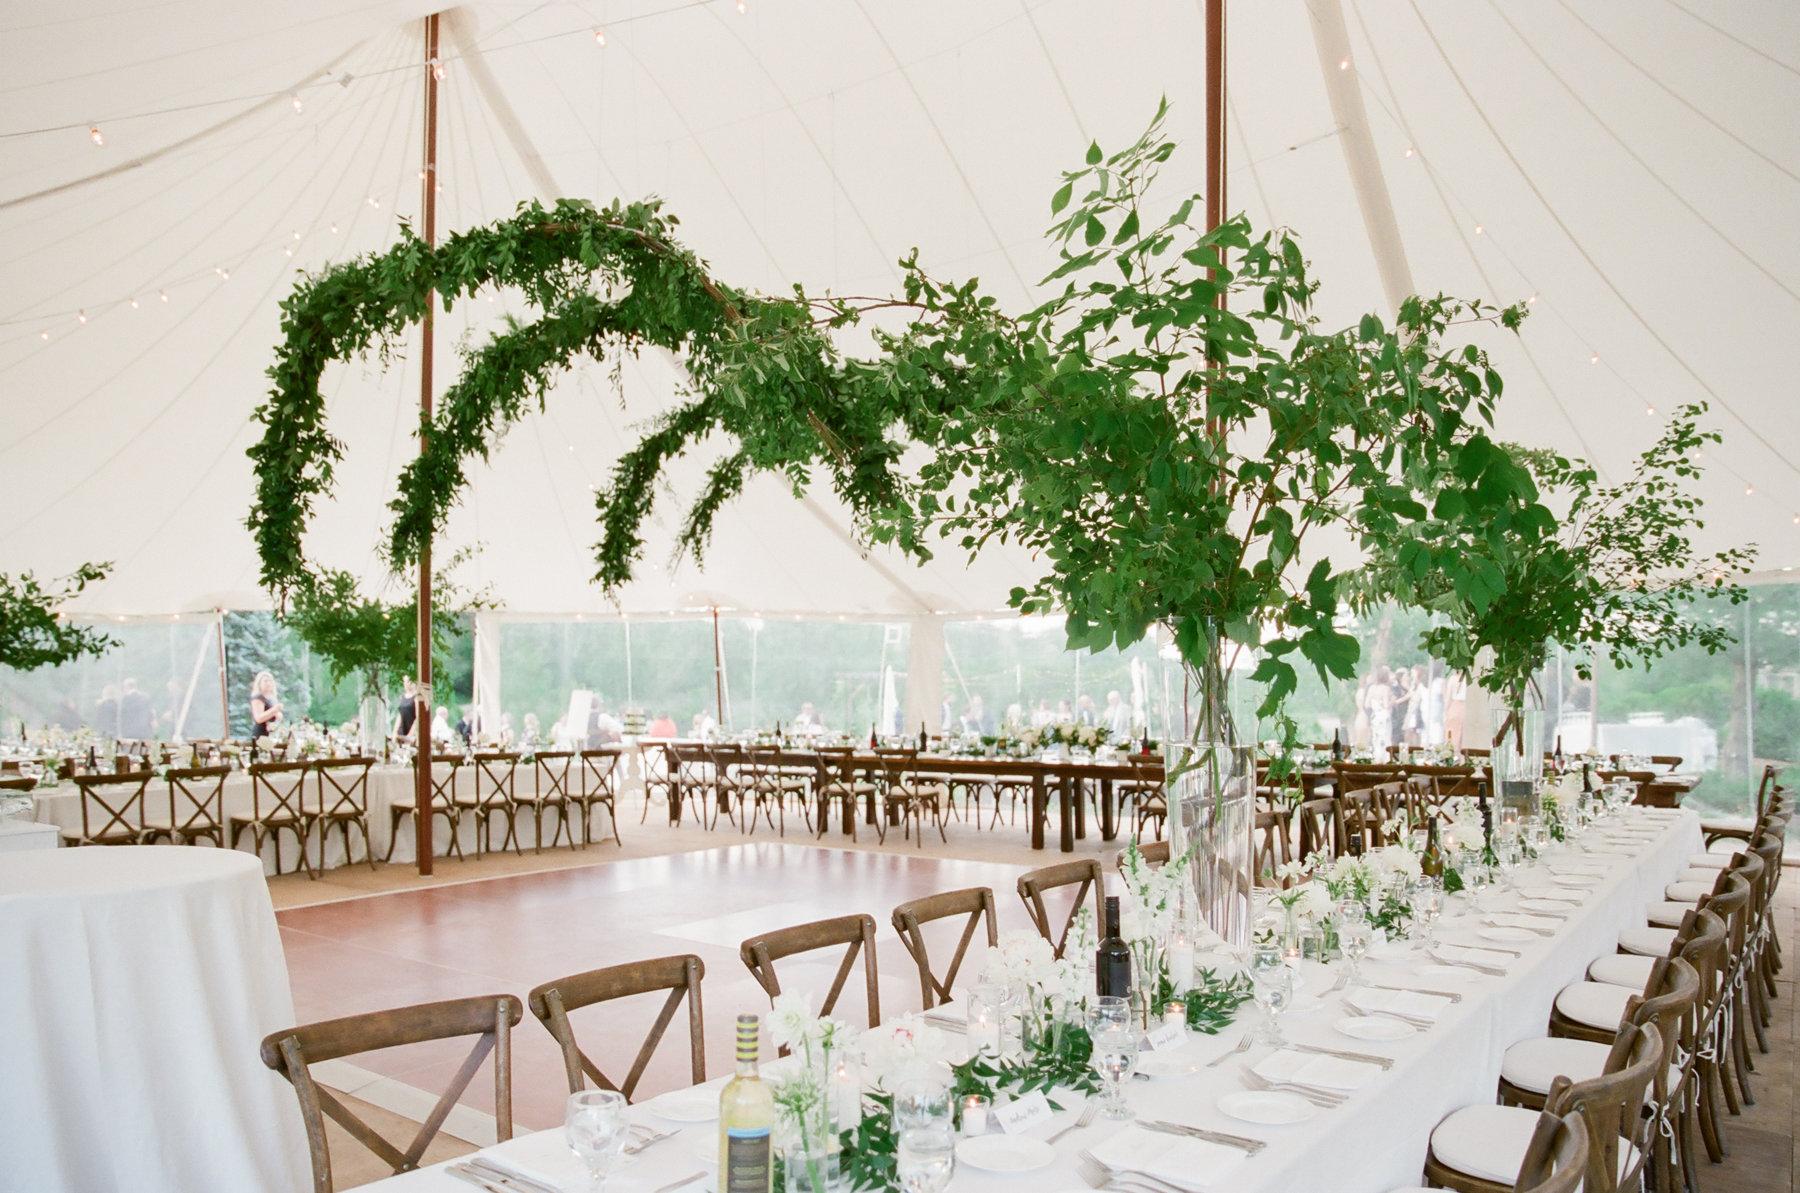 0772-maggiebrett-private-estate-wedding-000006320001.jpg